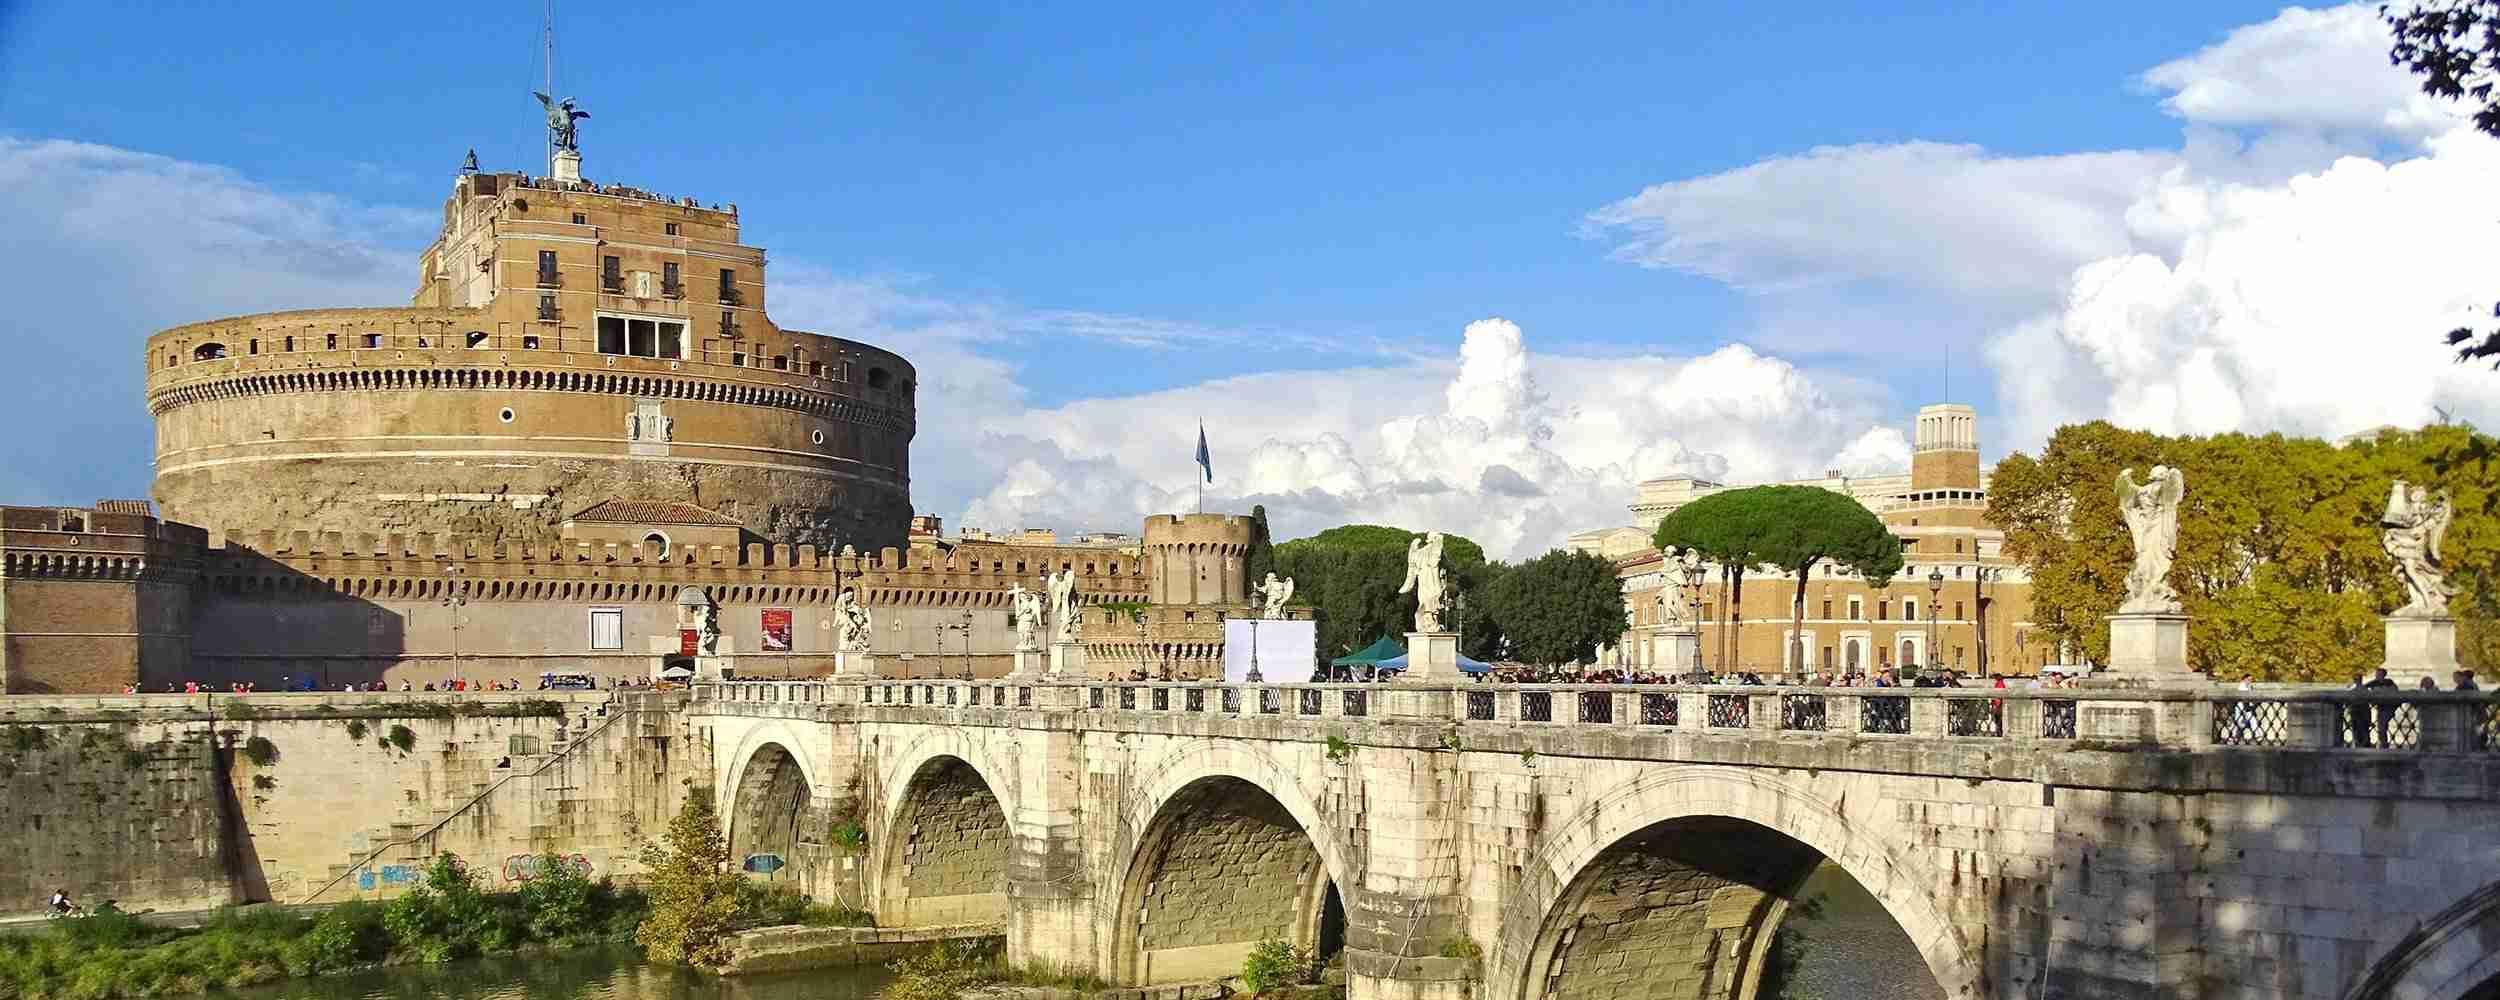 Roma Instagram Tour da Piazza San Pietro a Piazza di Spagna